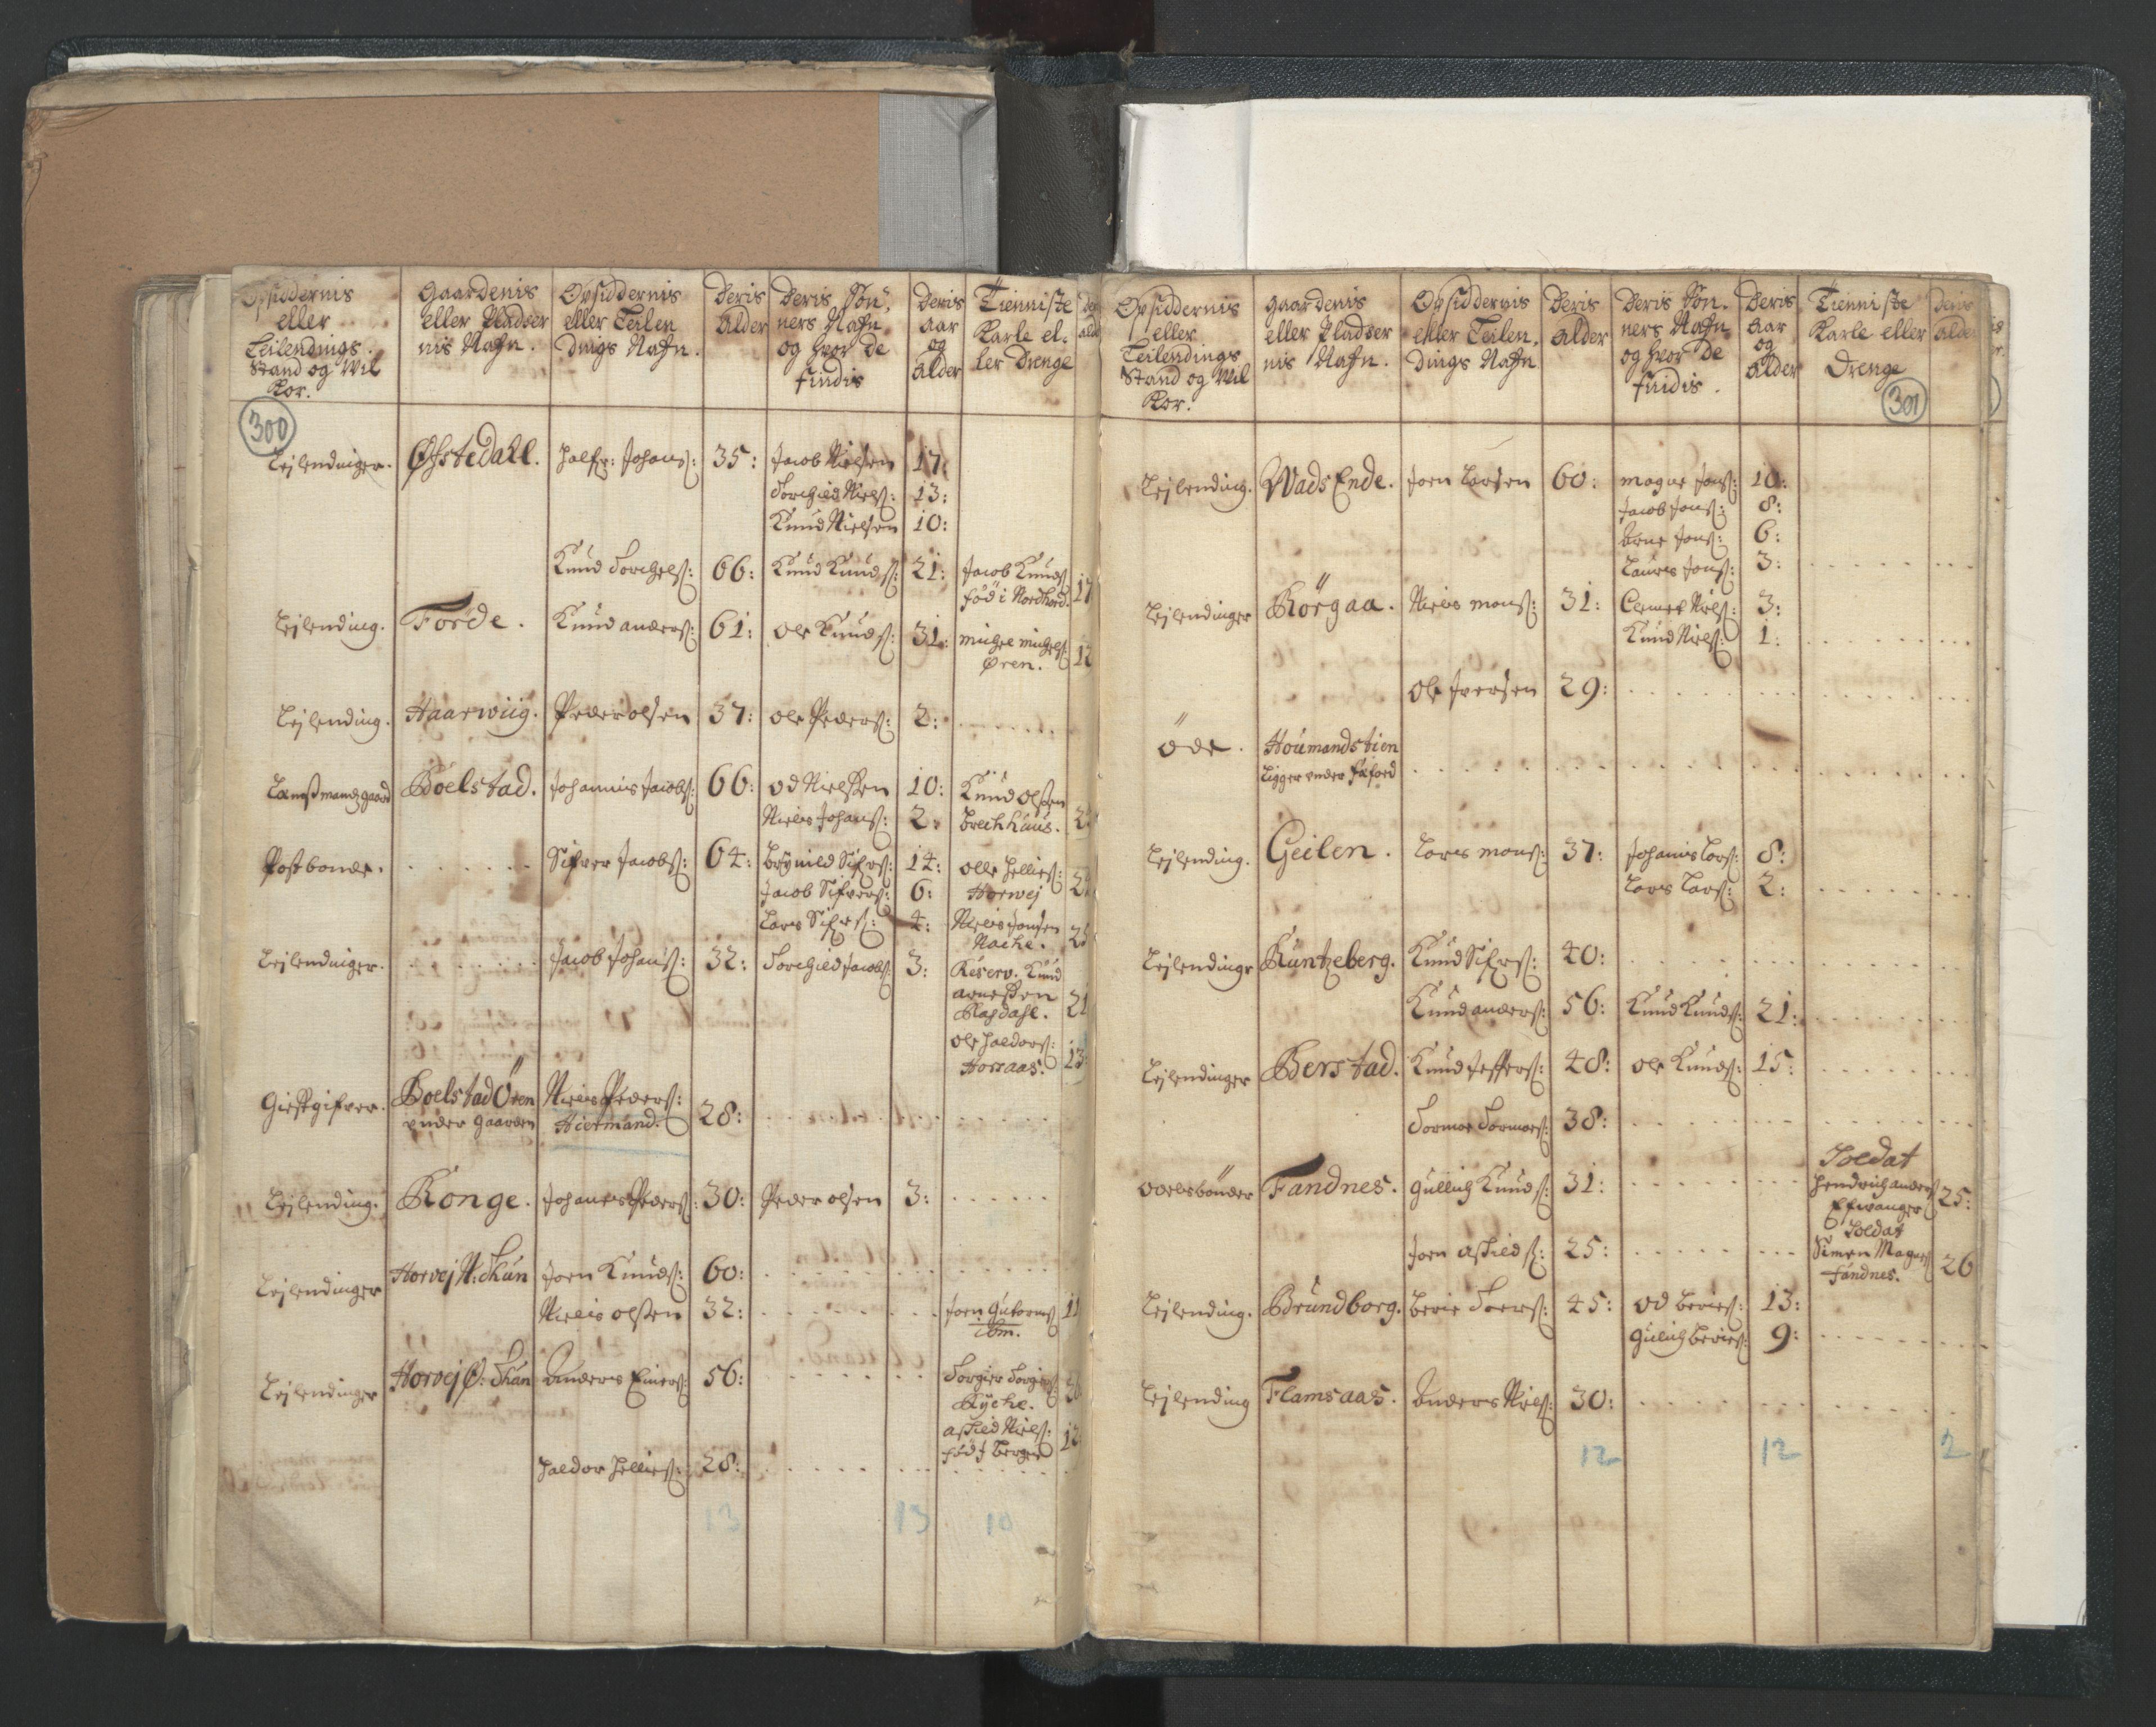 RA, Manntallet 1701, nr. 7: Nordhordland og Voss fogderi, 1701, s. 300-301